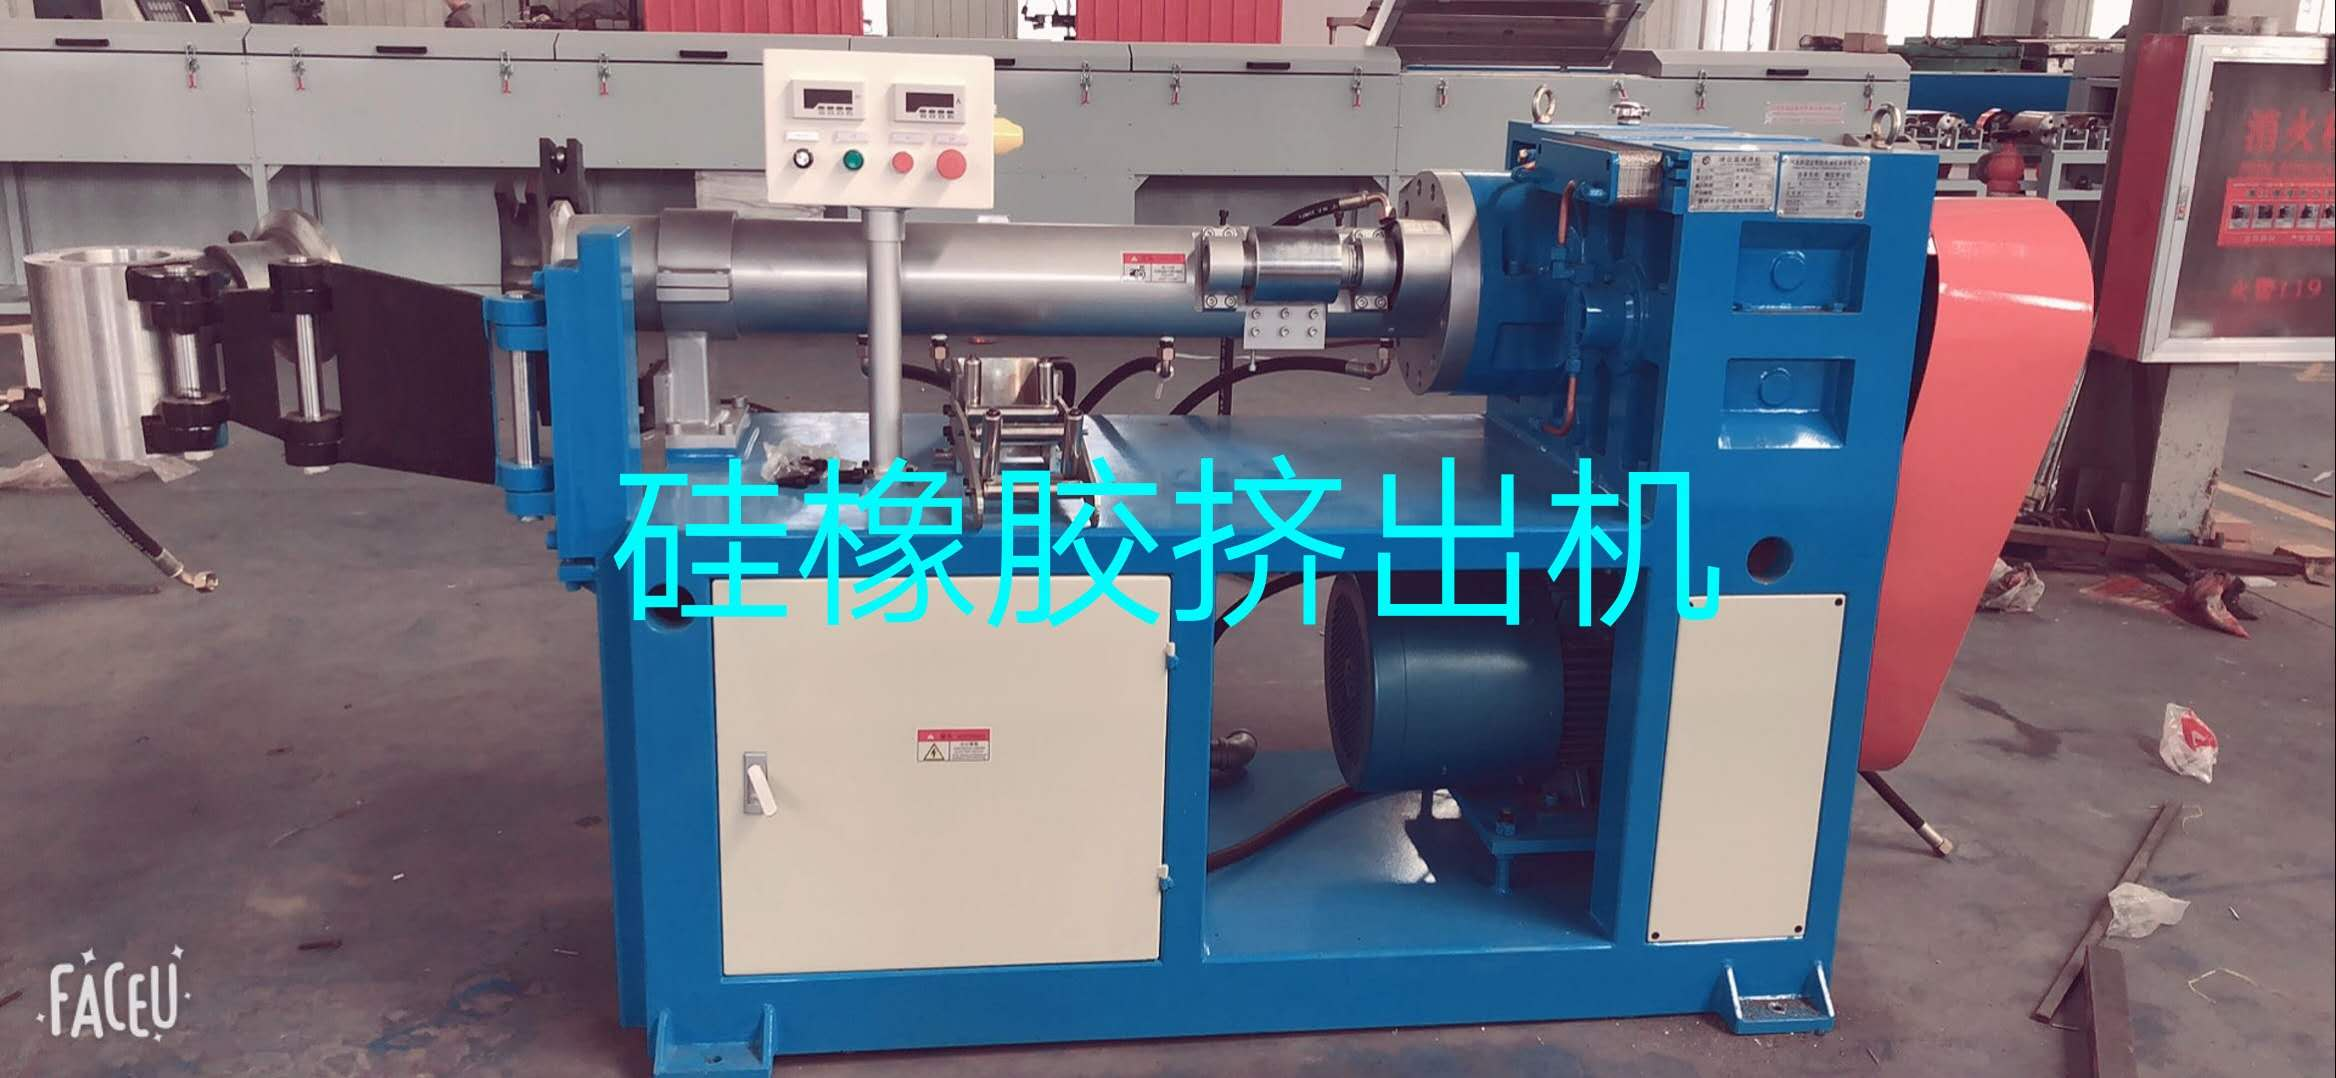 橡胶挤出机,硅橡胶挤出机,硅橡胶挤出设备的设计原理